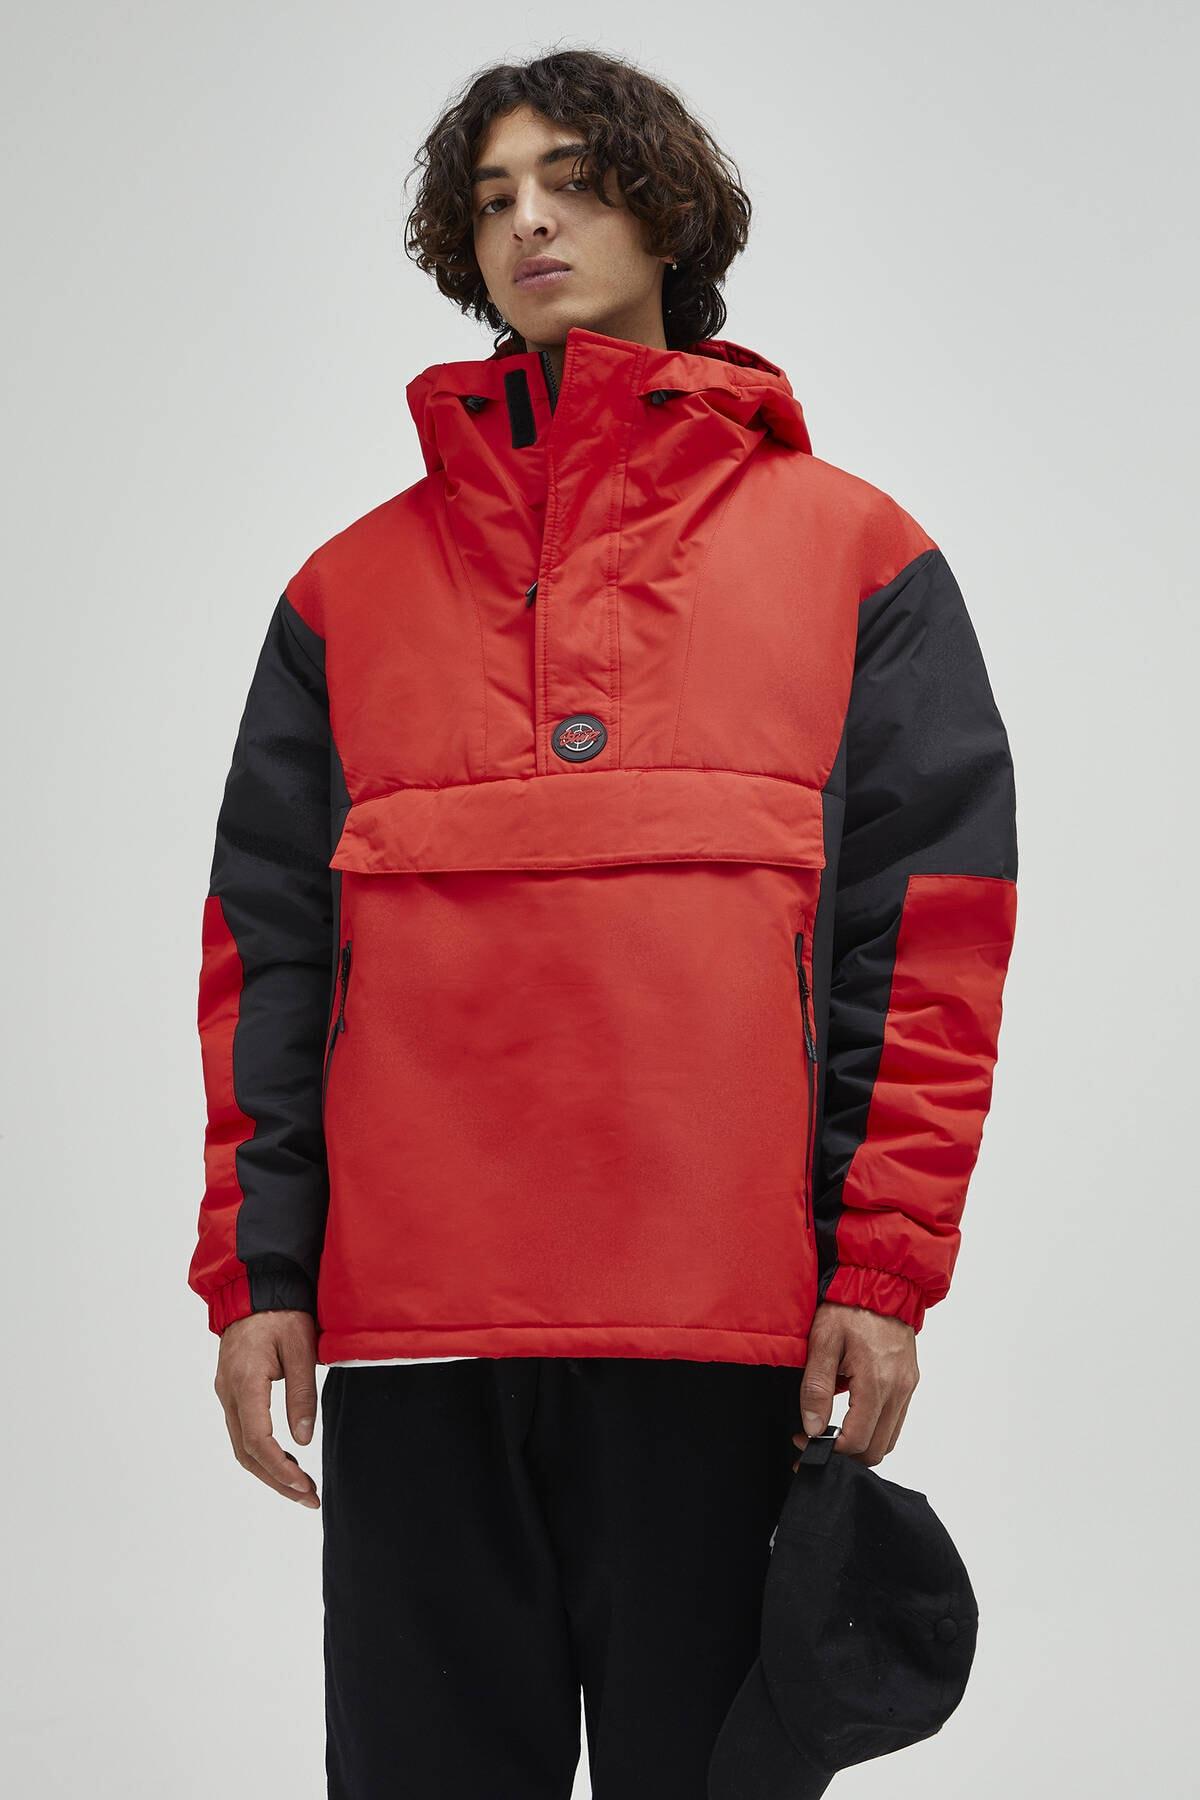 Pull & Bear Erkek Kırmızı Logolu Fermuarlı Kanguru Mont 09710526 0